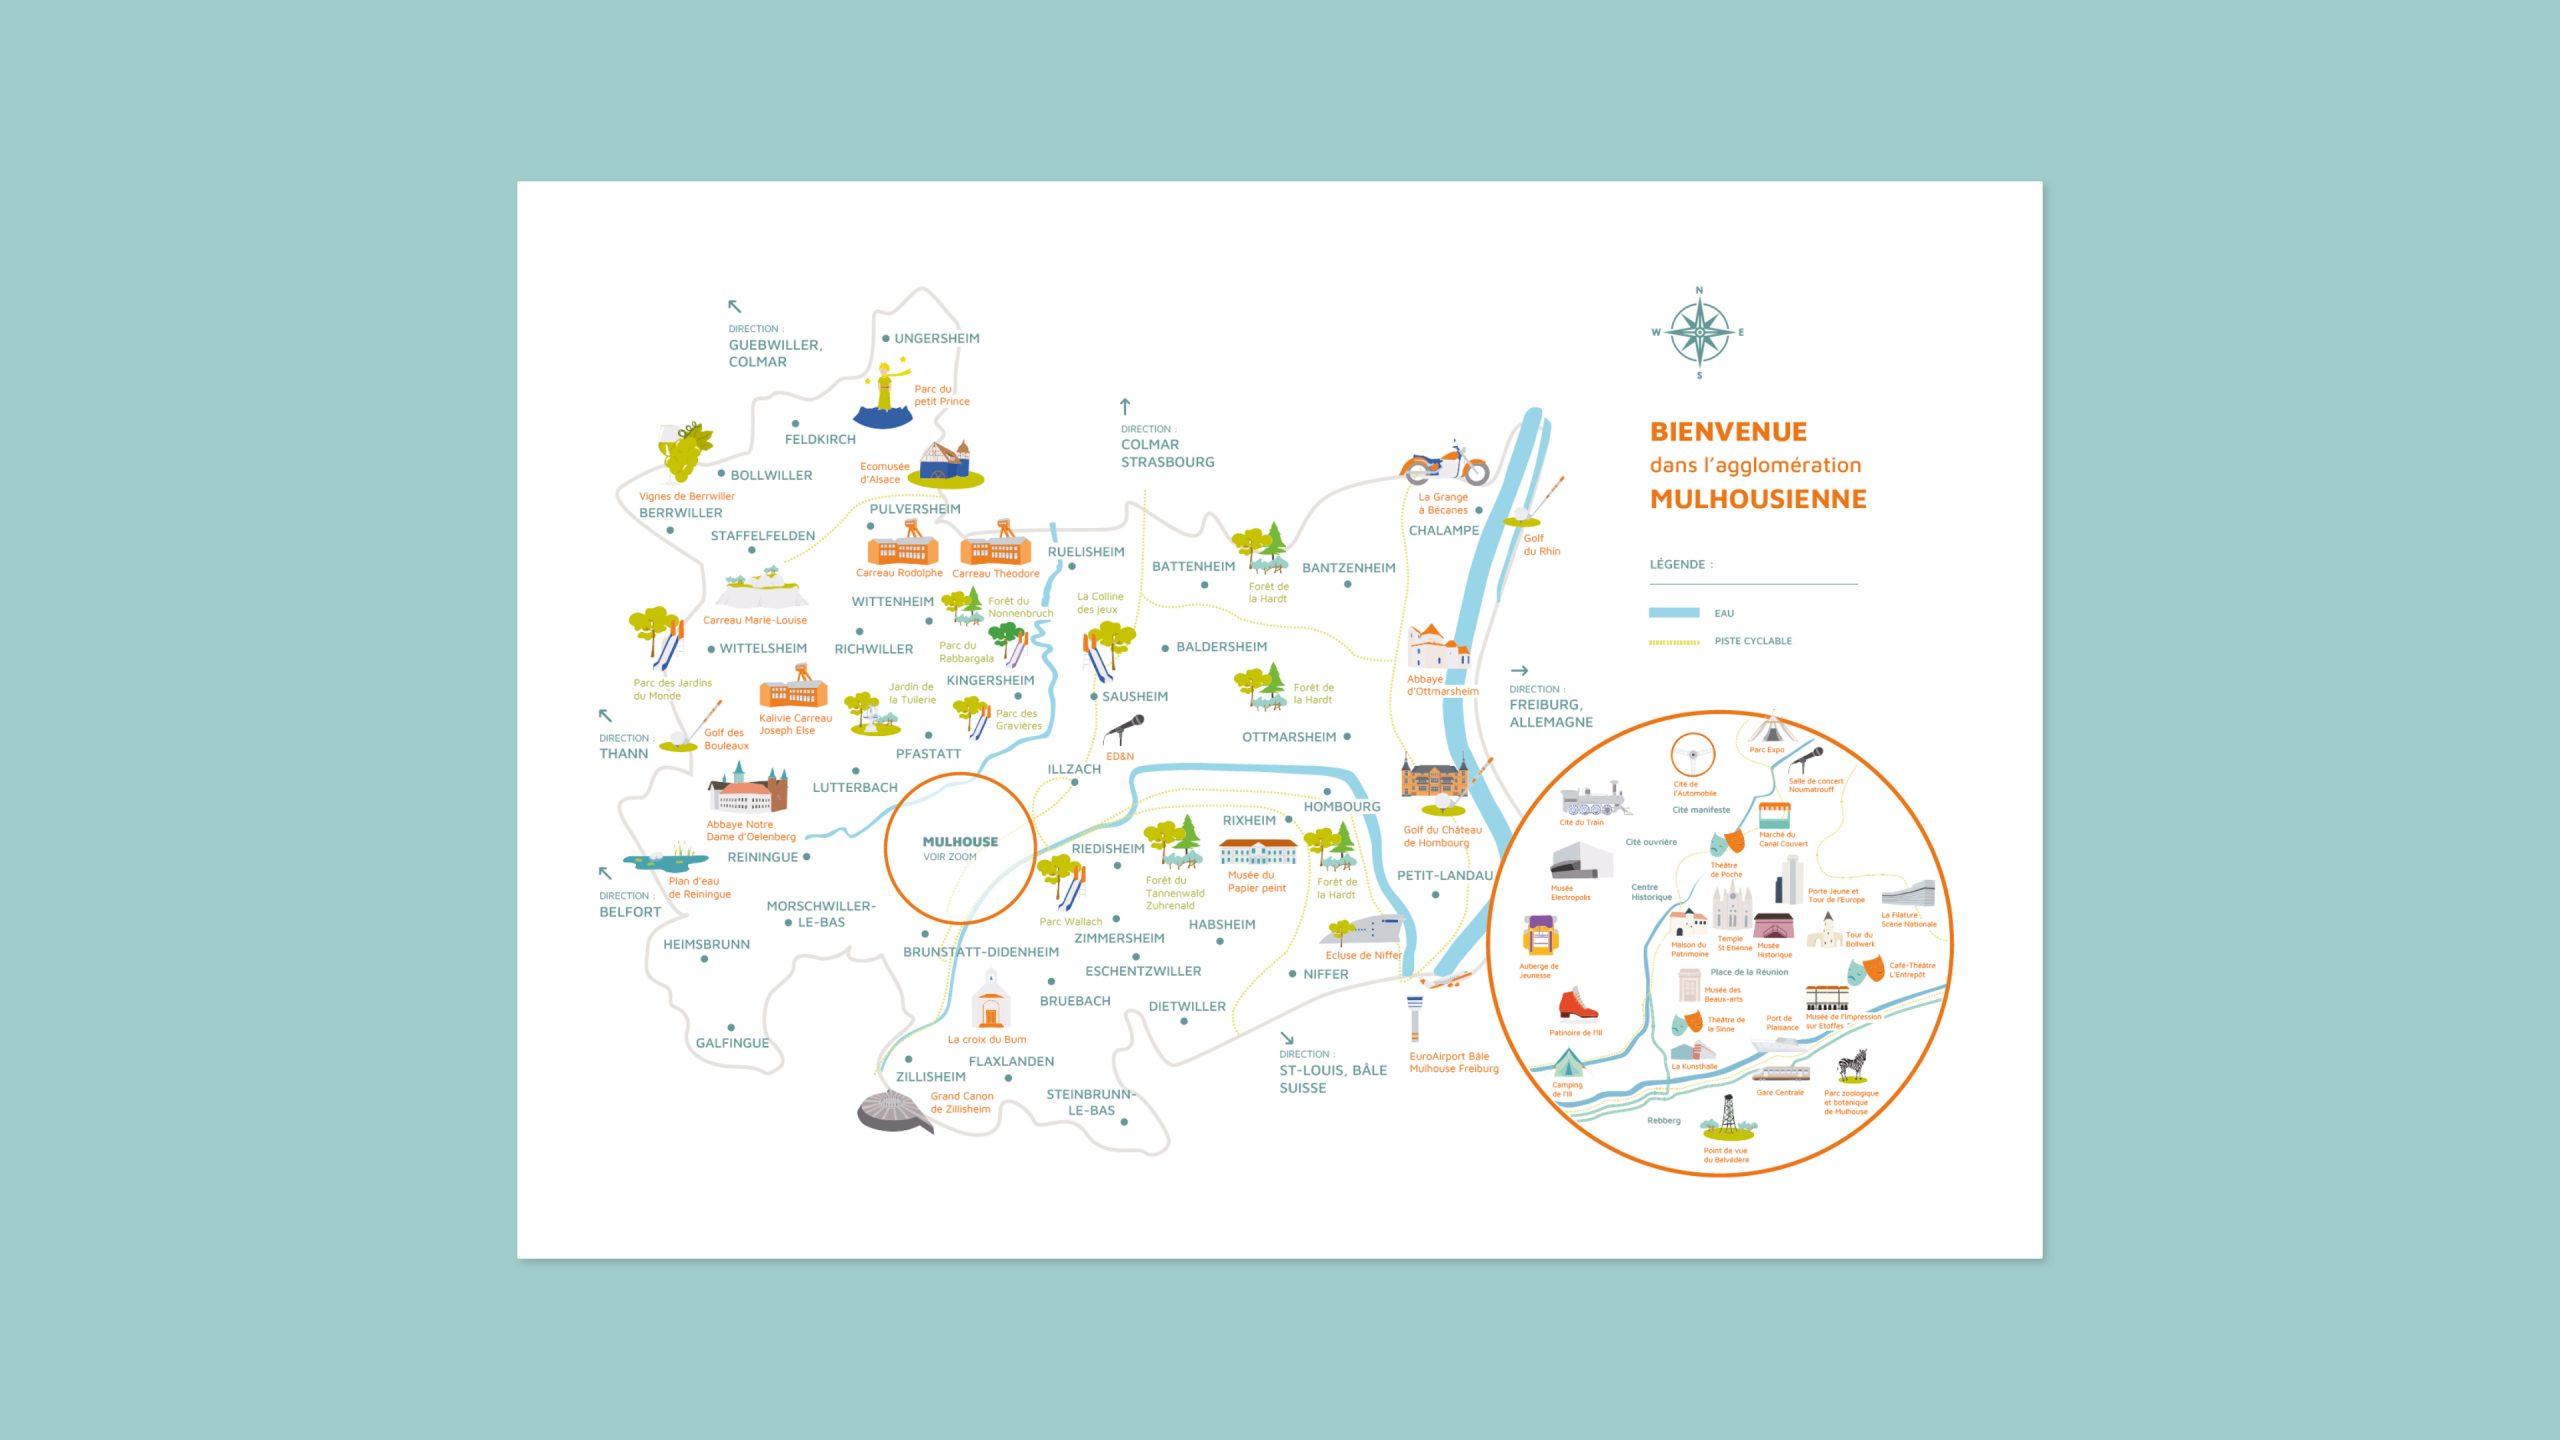 marion-carlier-carte-mulhouse-agglomeration-agence-greencub@2x